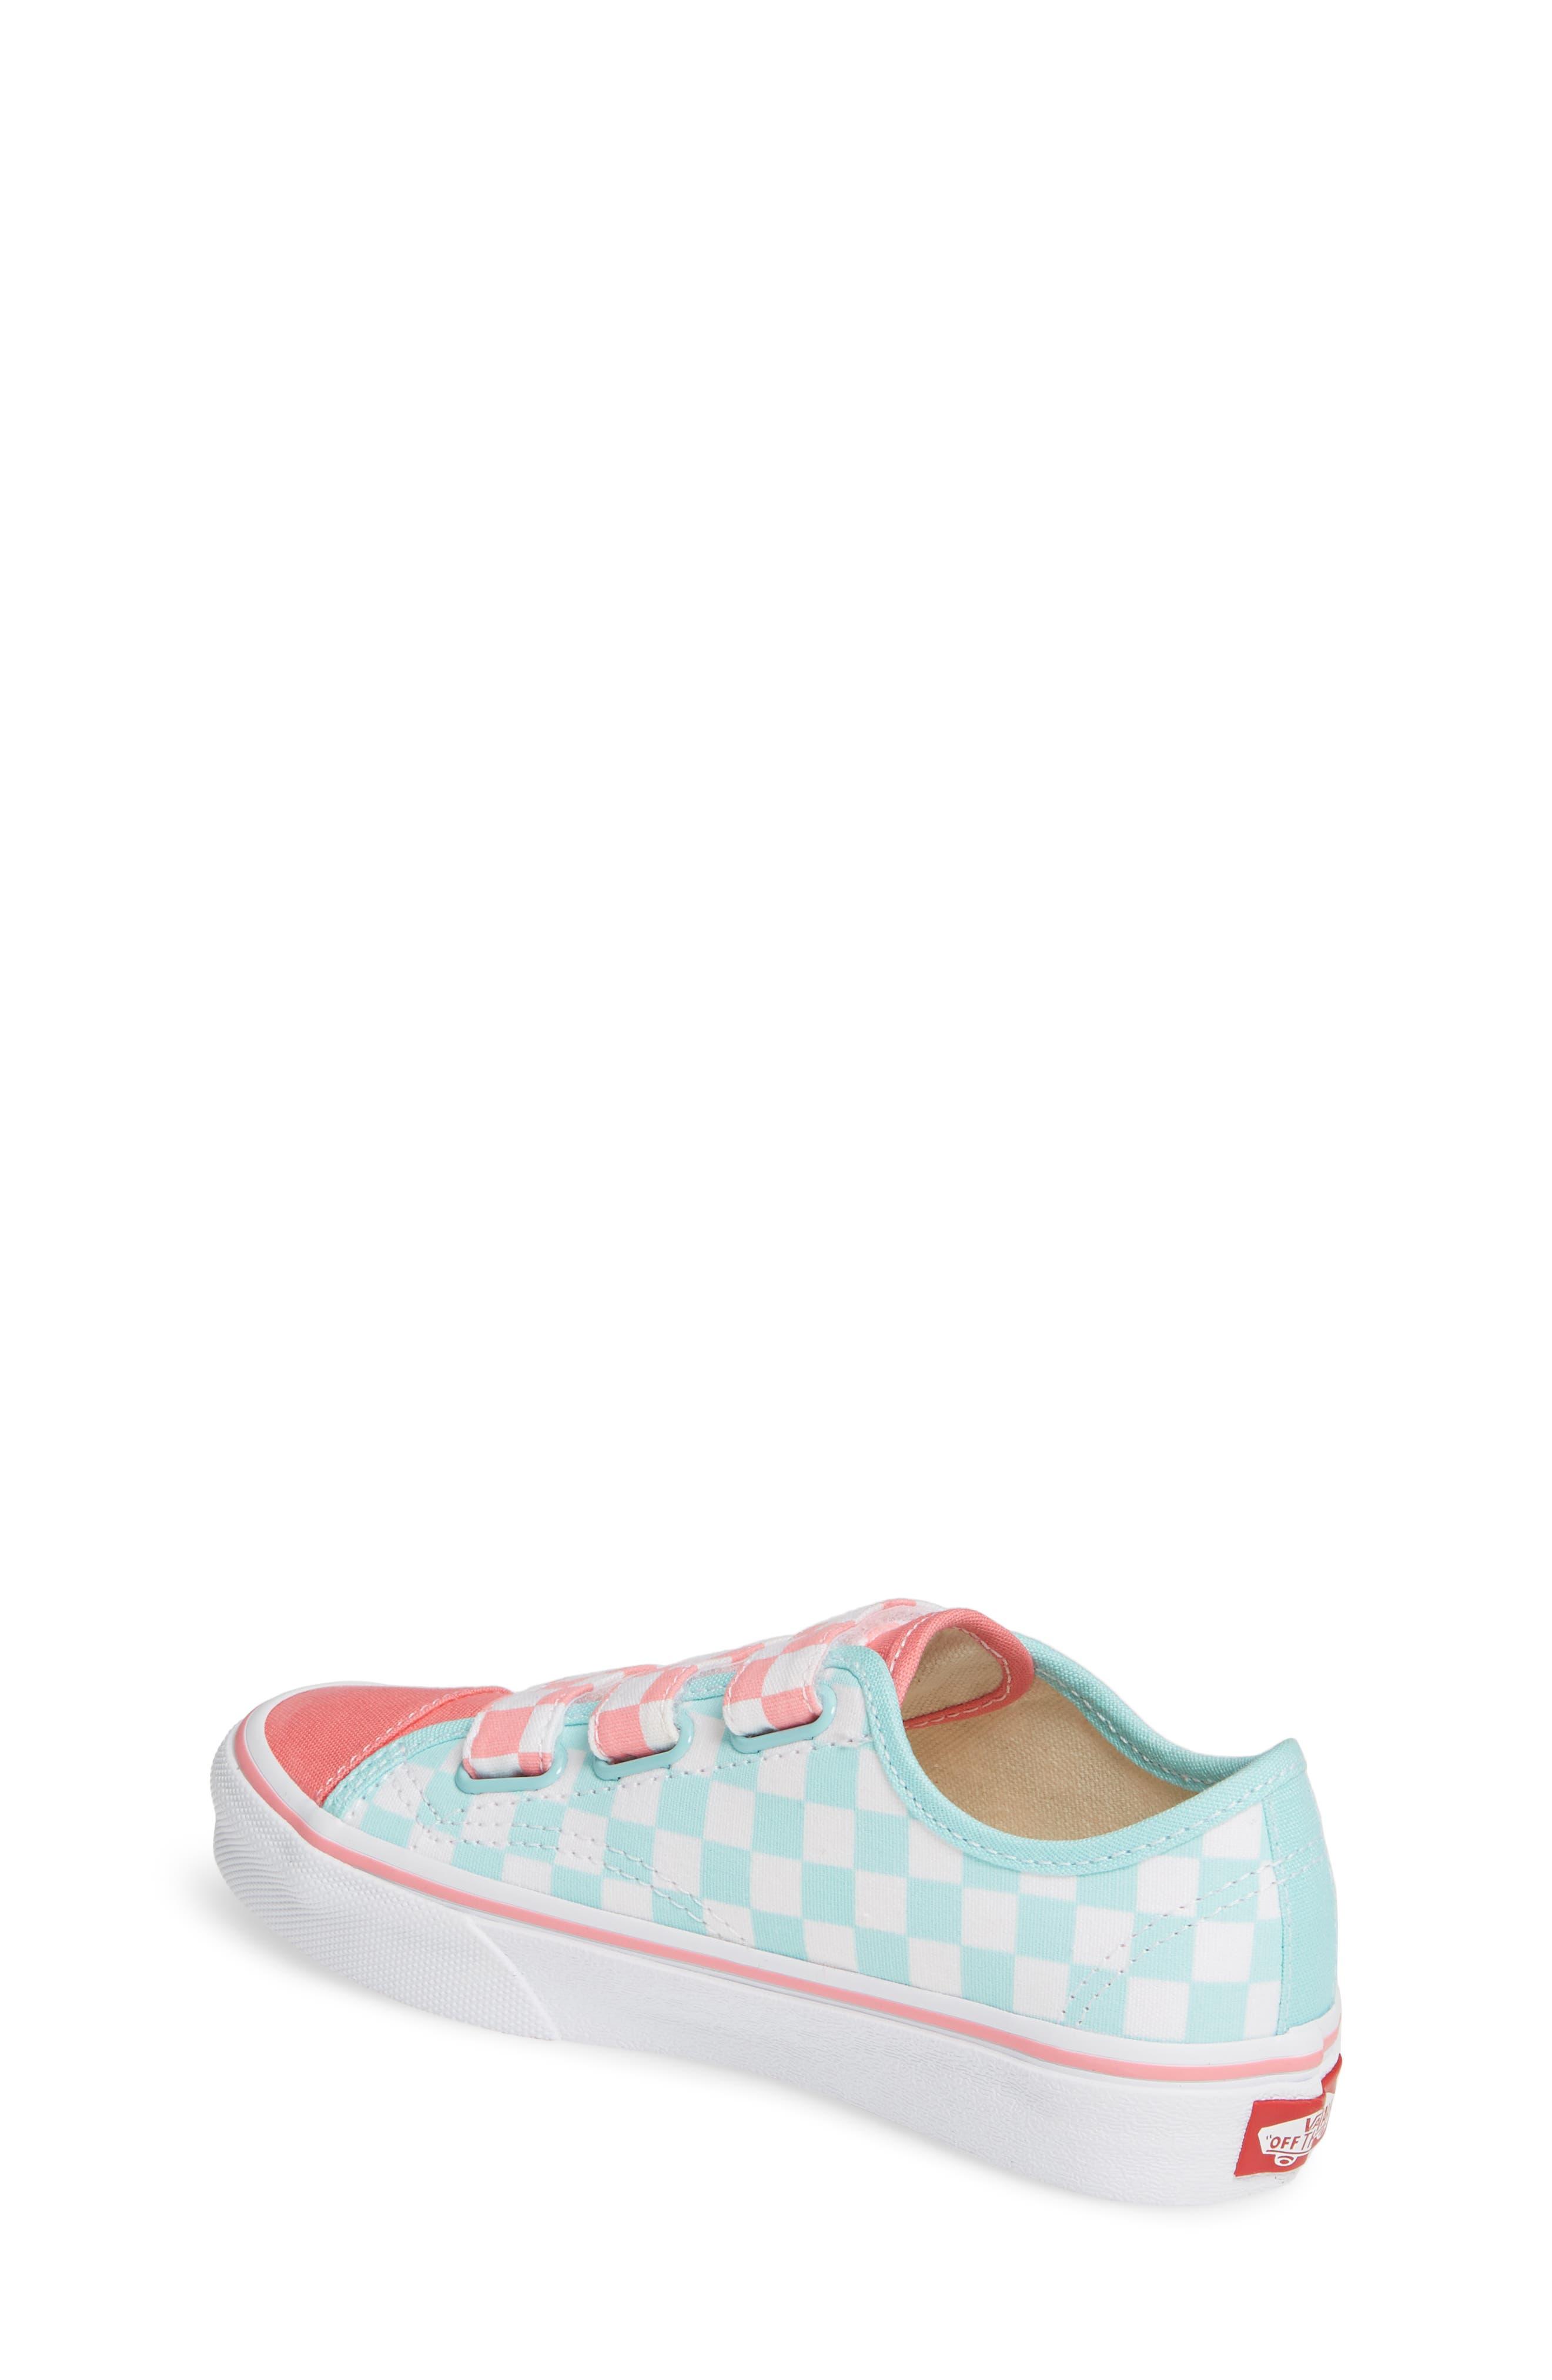 VANS, Style 23V Sneaker, Alternate thumbnail 2, color, BLUE TINT/ STRAWBERRY PINK